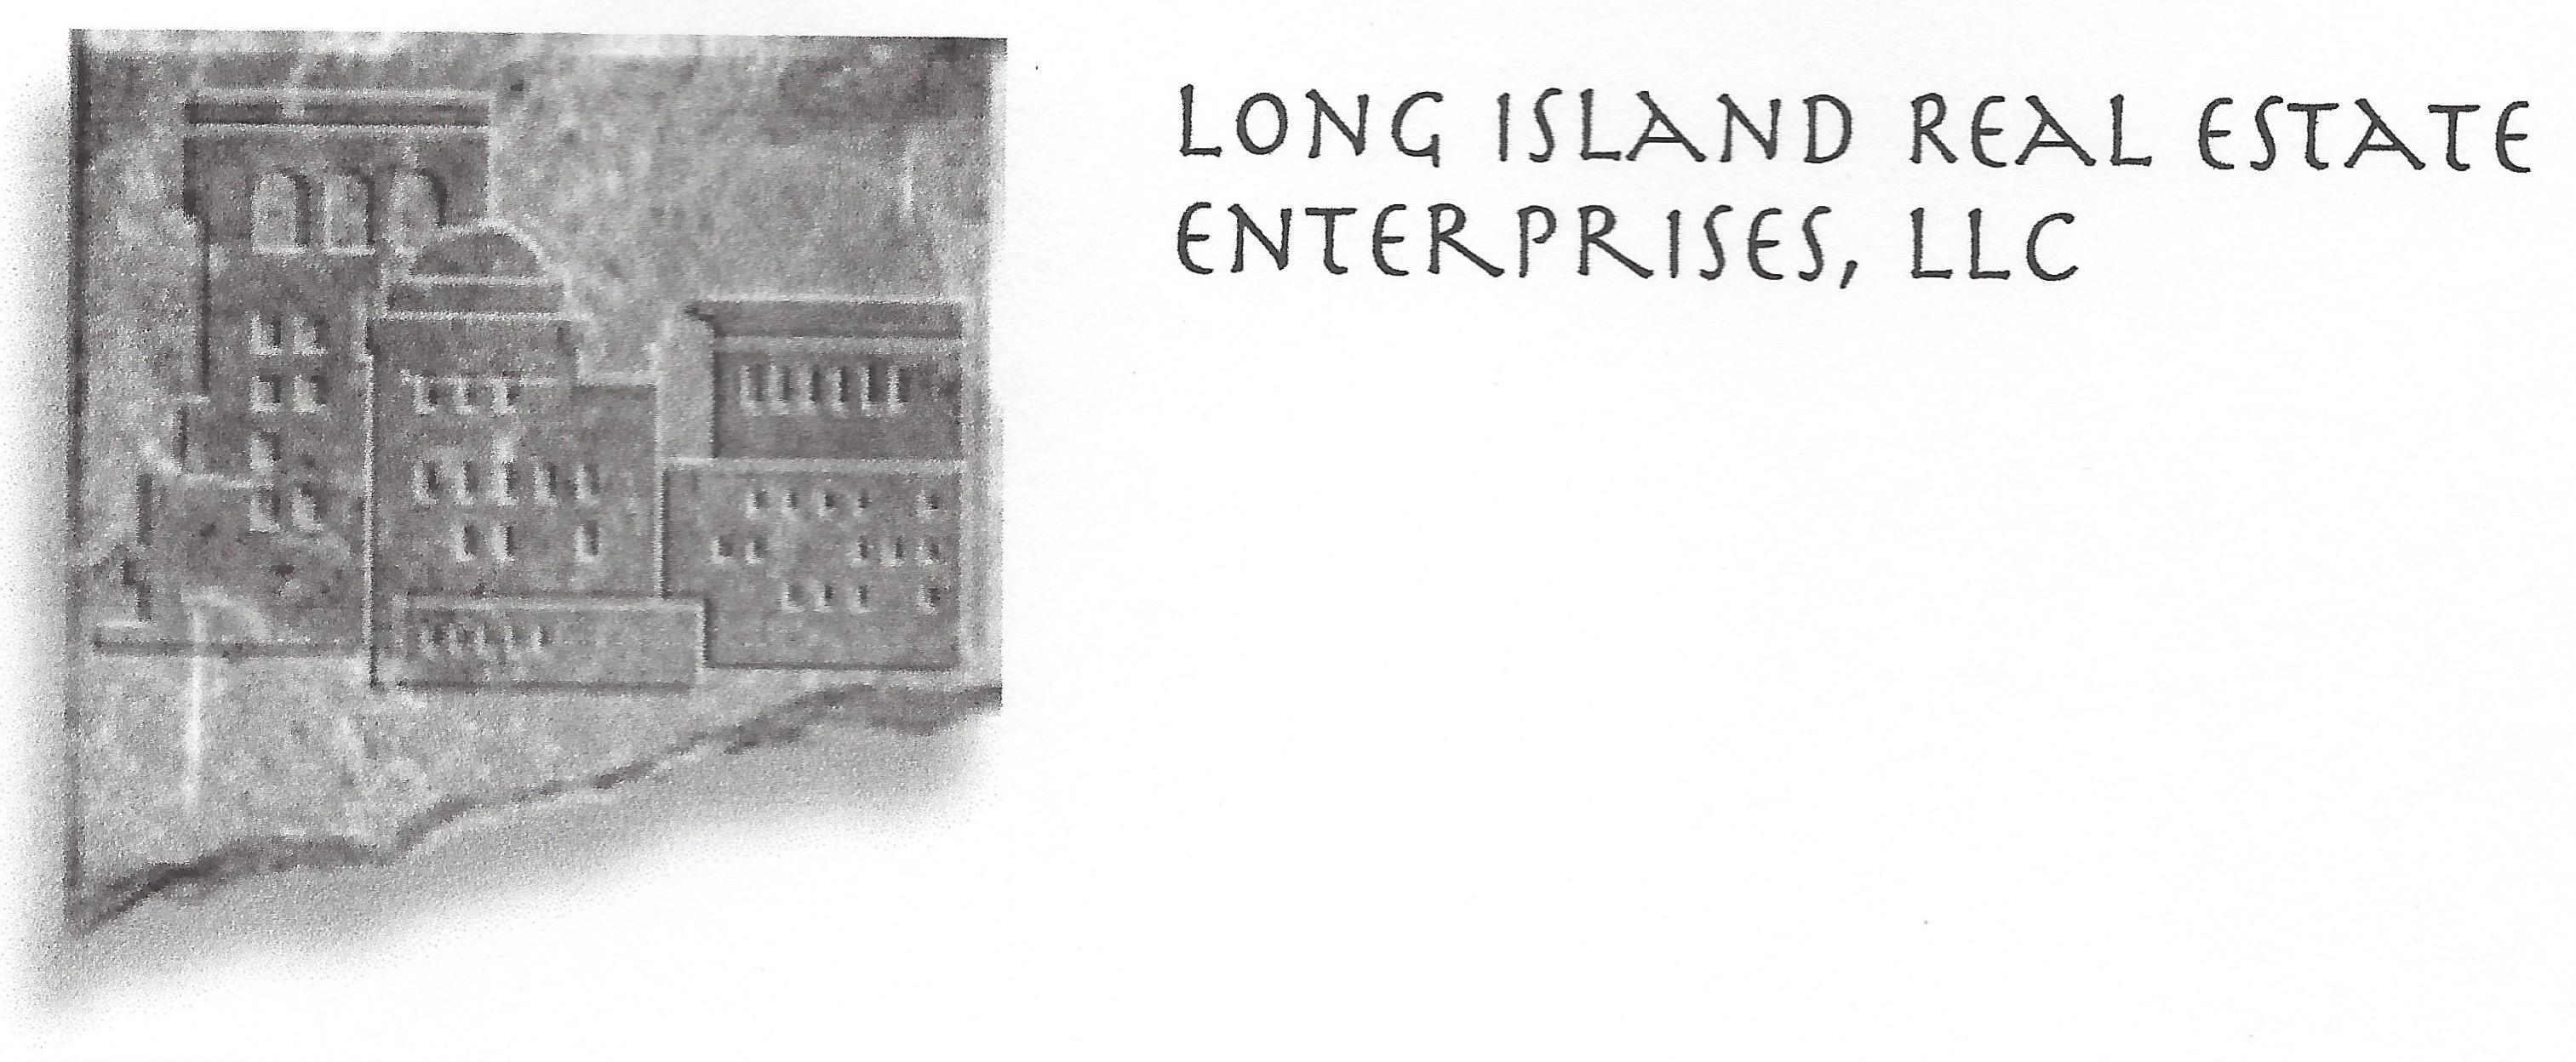 Long Island Real Estate Enterprises, LLC